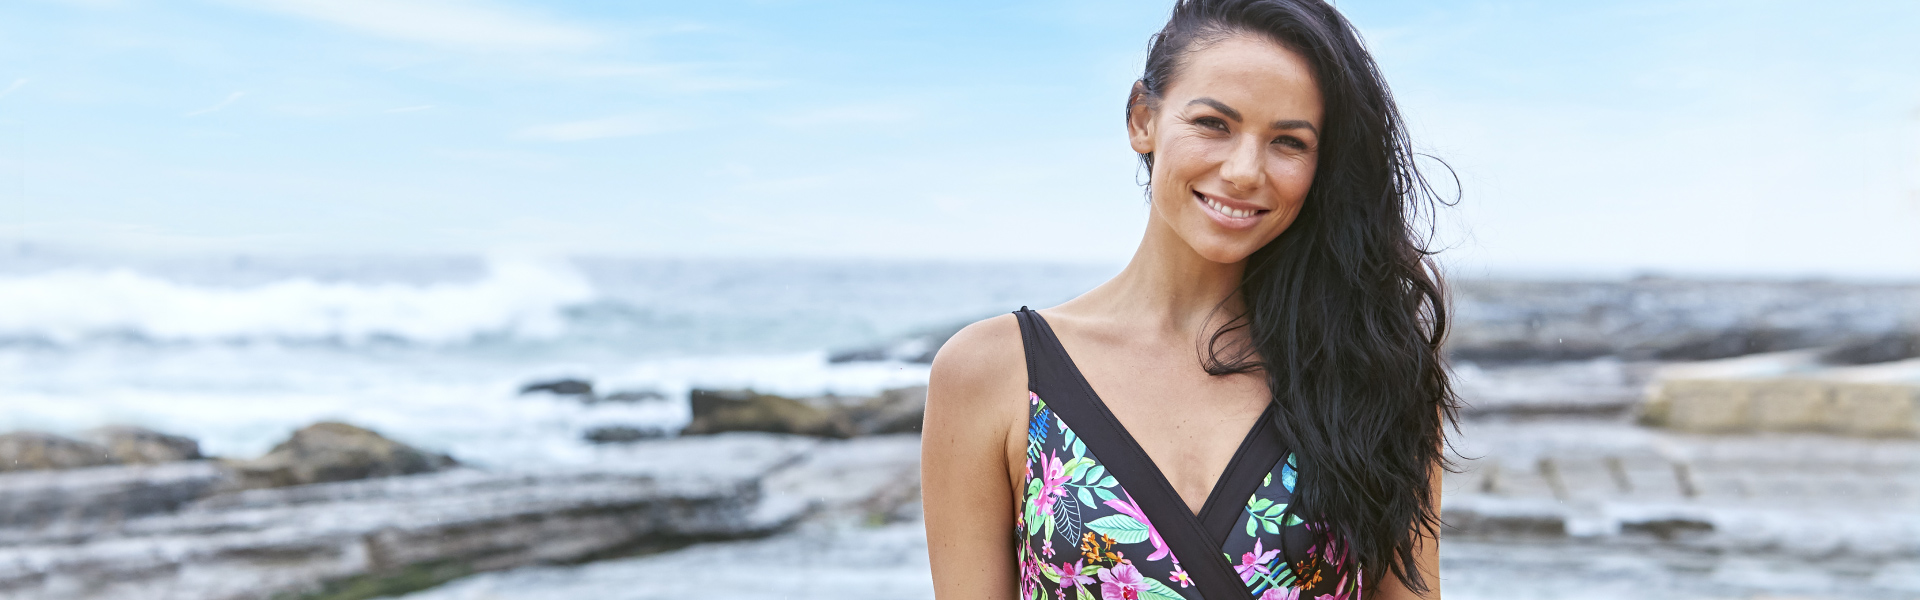 Top Picks: 100% Chlorine Proof Swimwear for Women